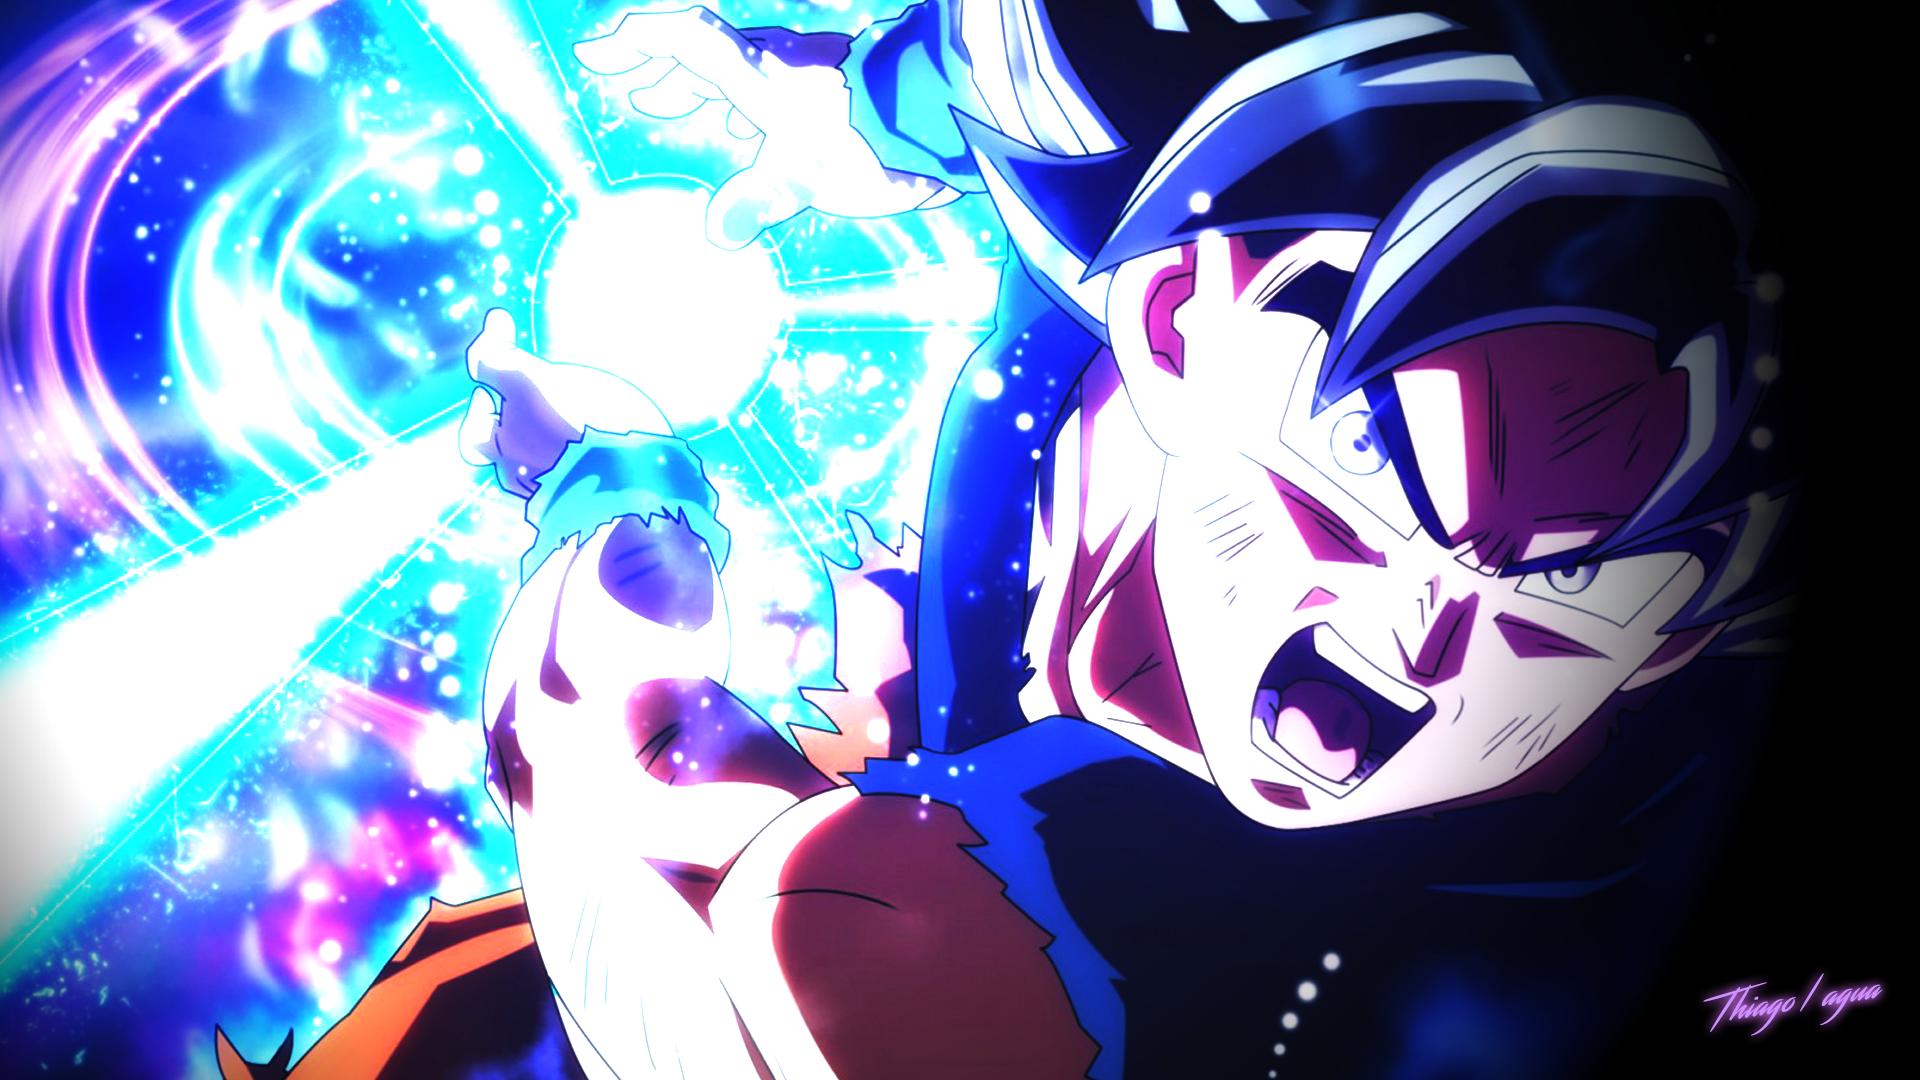 Dragonball Super Goku Migatte No Gokui Wallpaper By Aguawave420